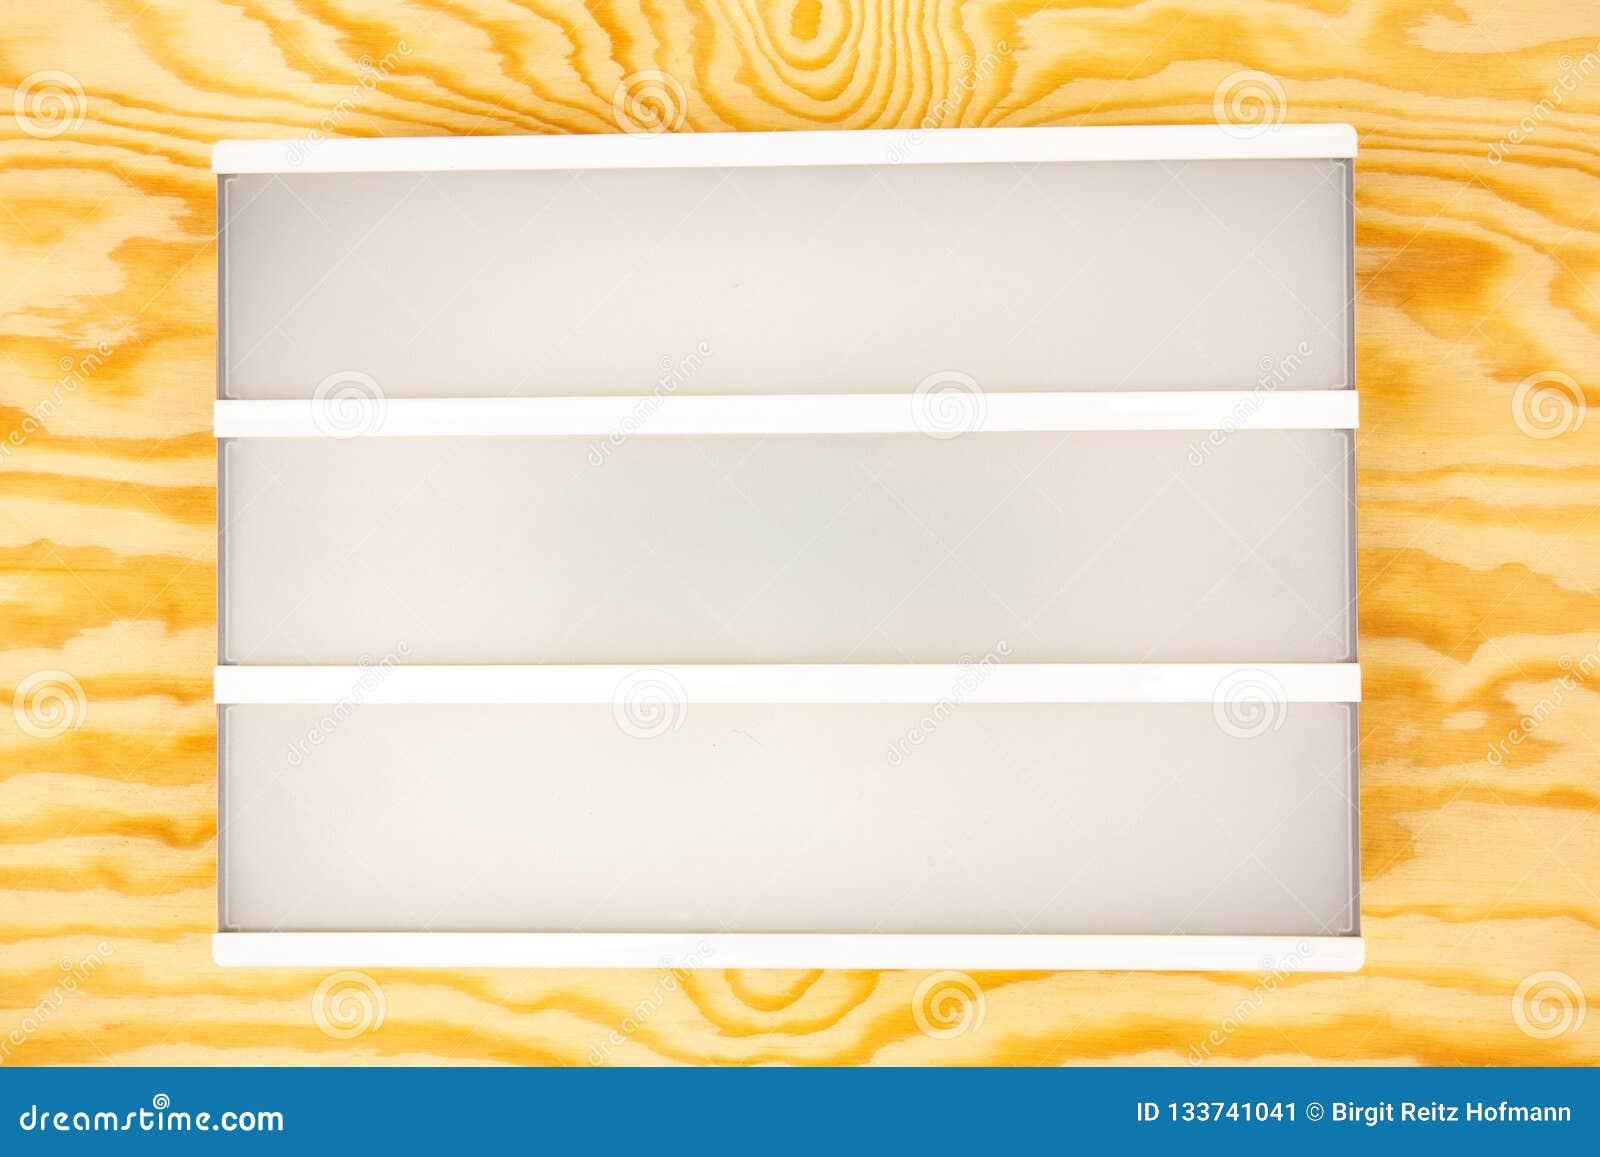 Letter Light Boxes.Blank Letter Light Box Stock Image Image Of Empty Pattern